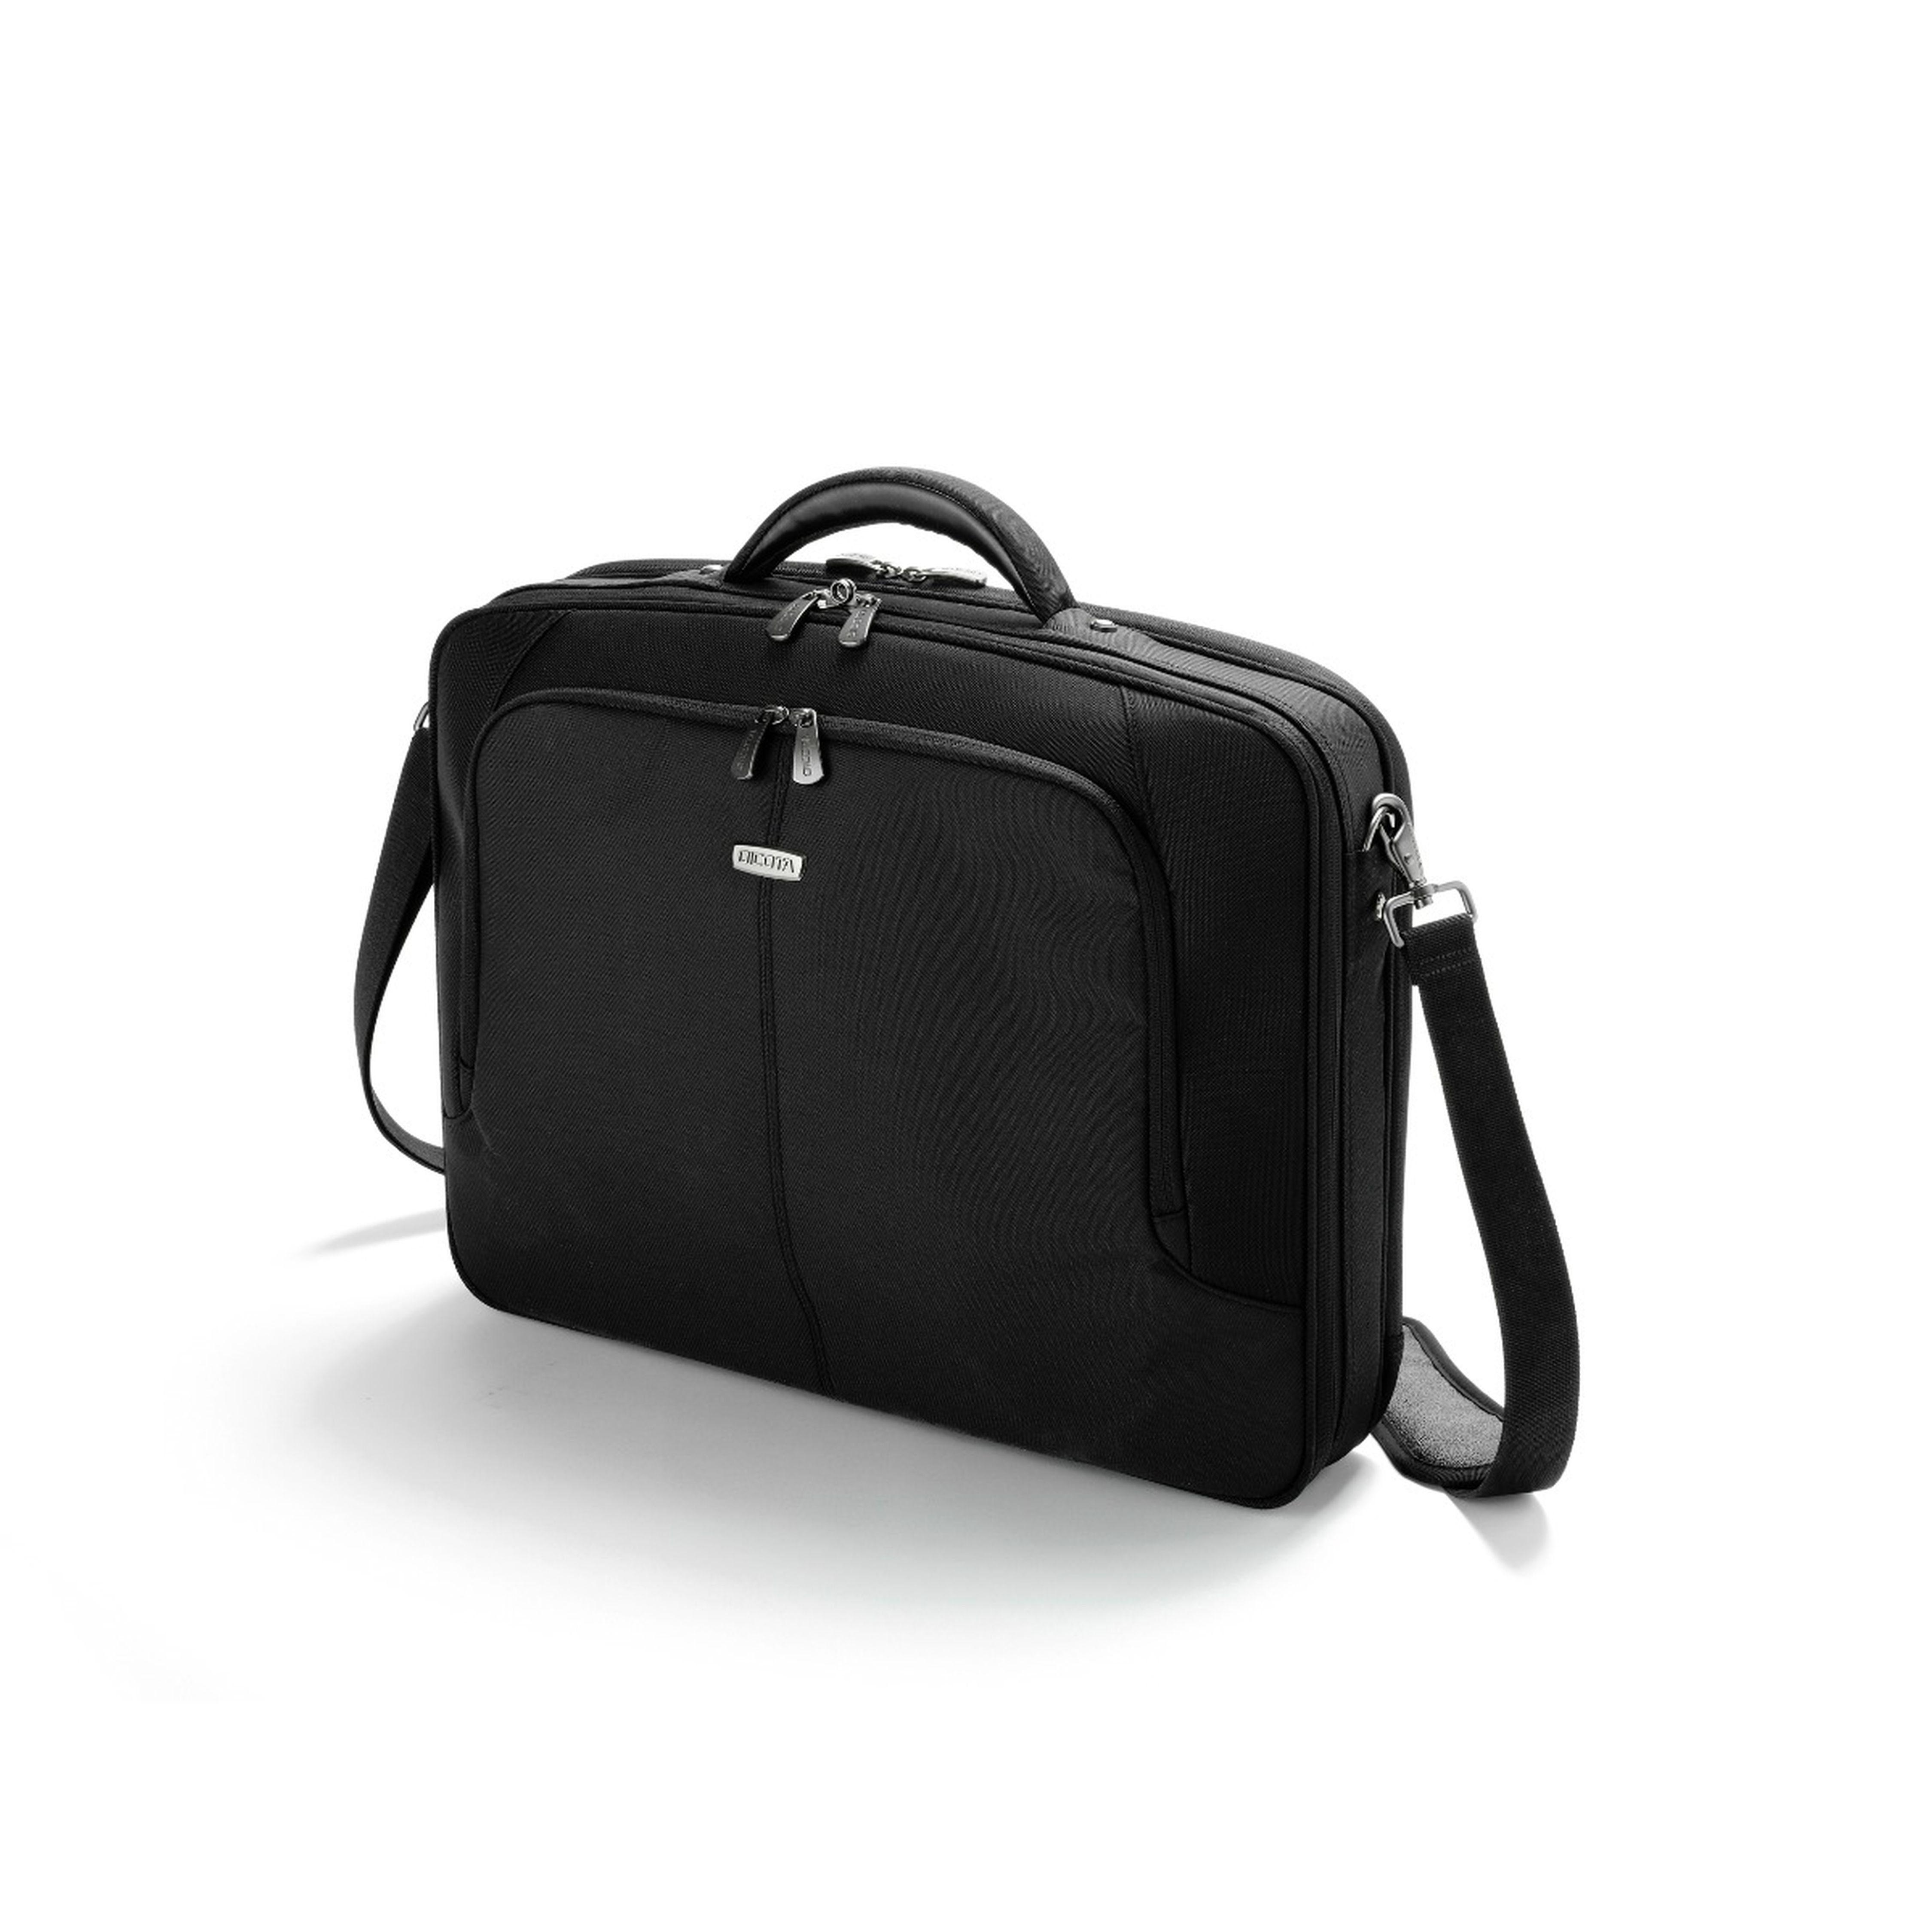 "DICOTA Kompakte Notebooktasche »Multi Plus (14"" - 15.6"")«"